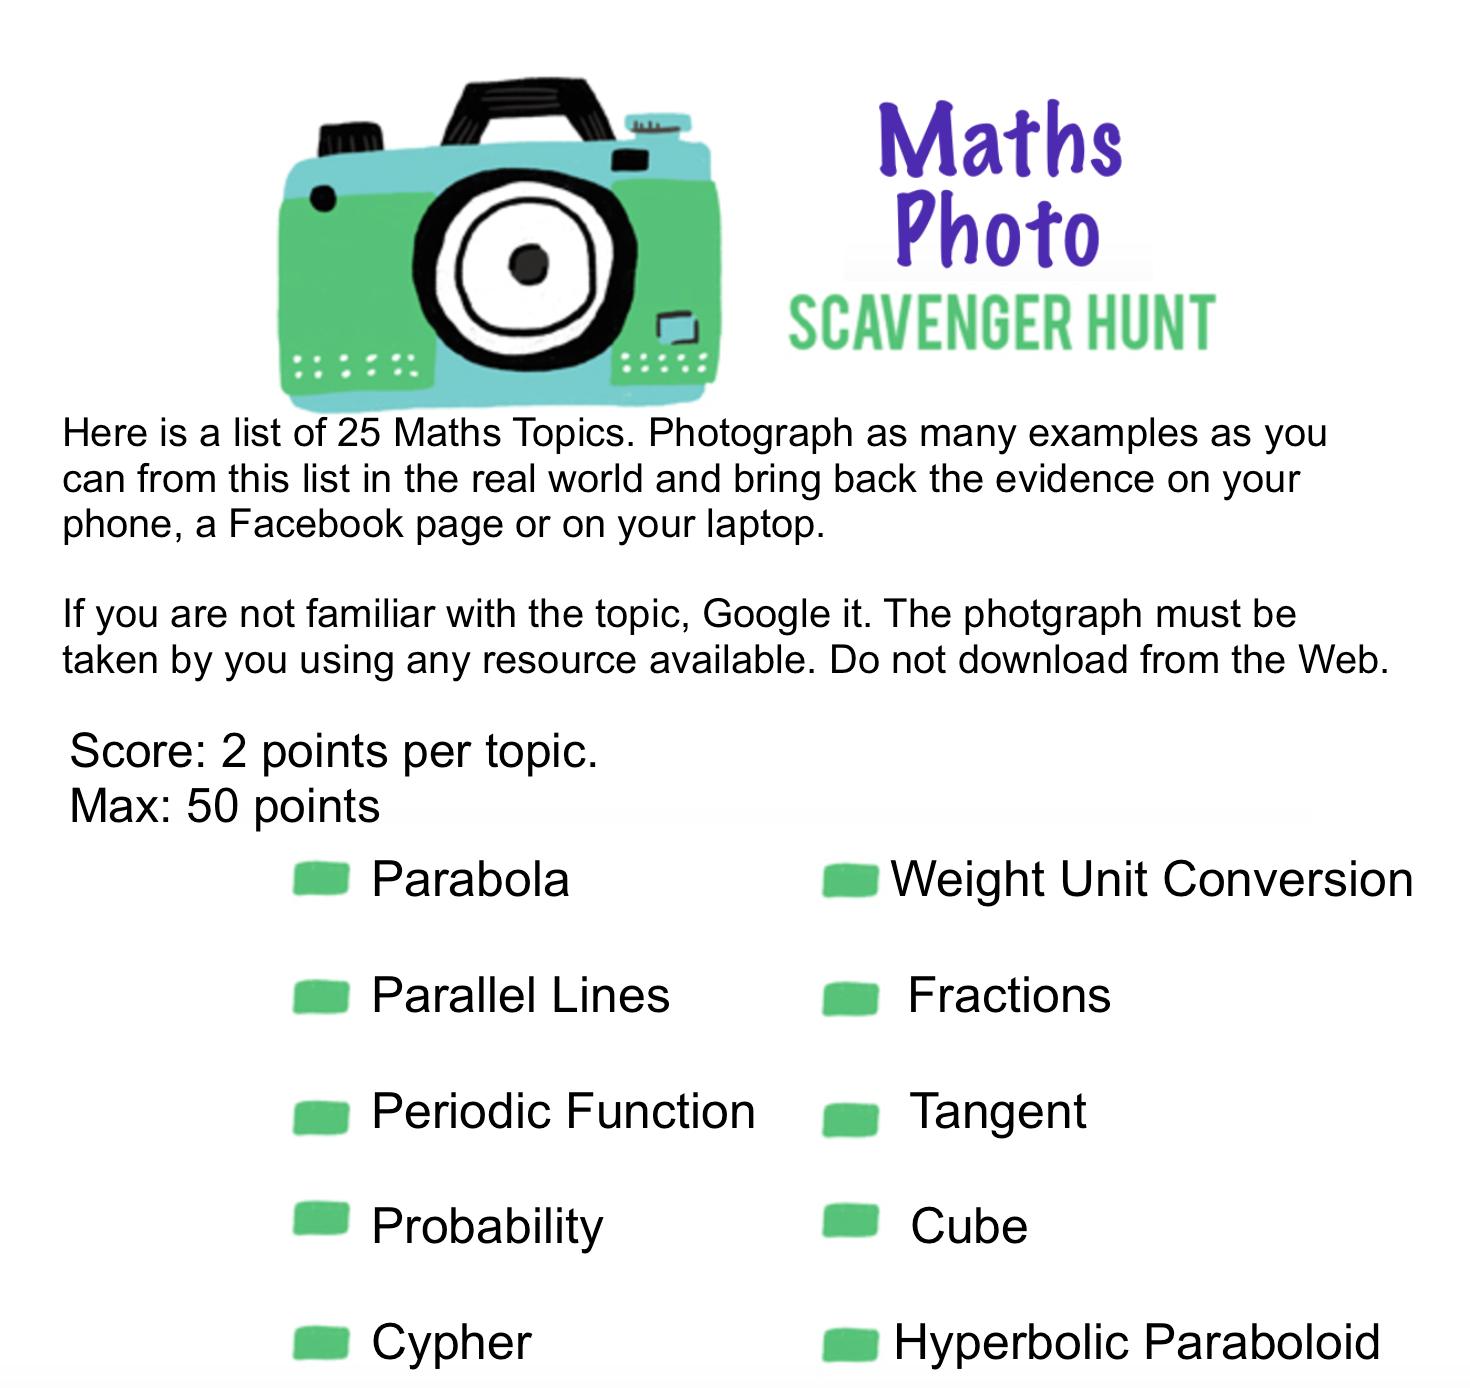 Maths Photo Scavenger Hunt Worksheet 1